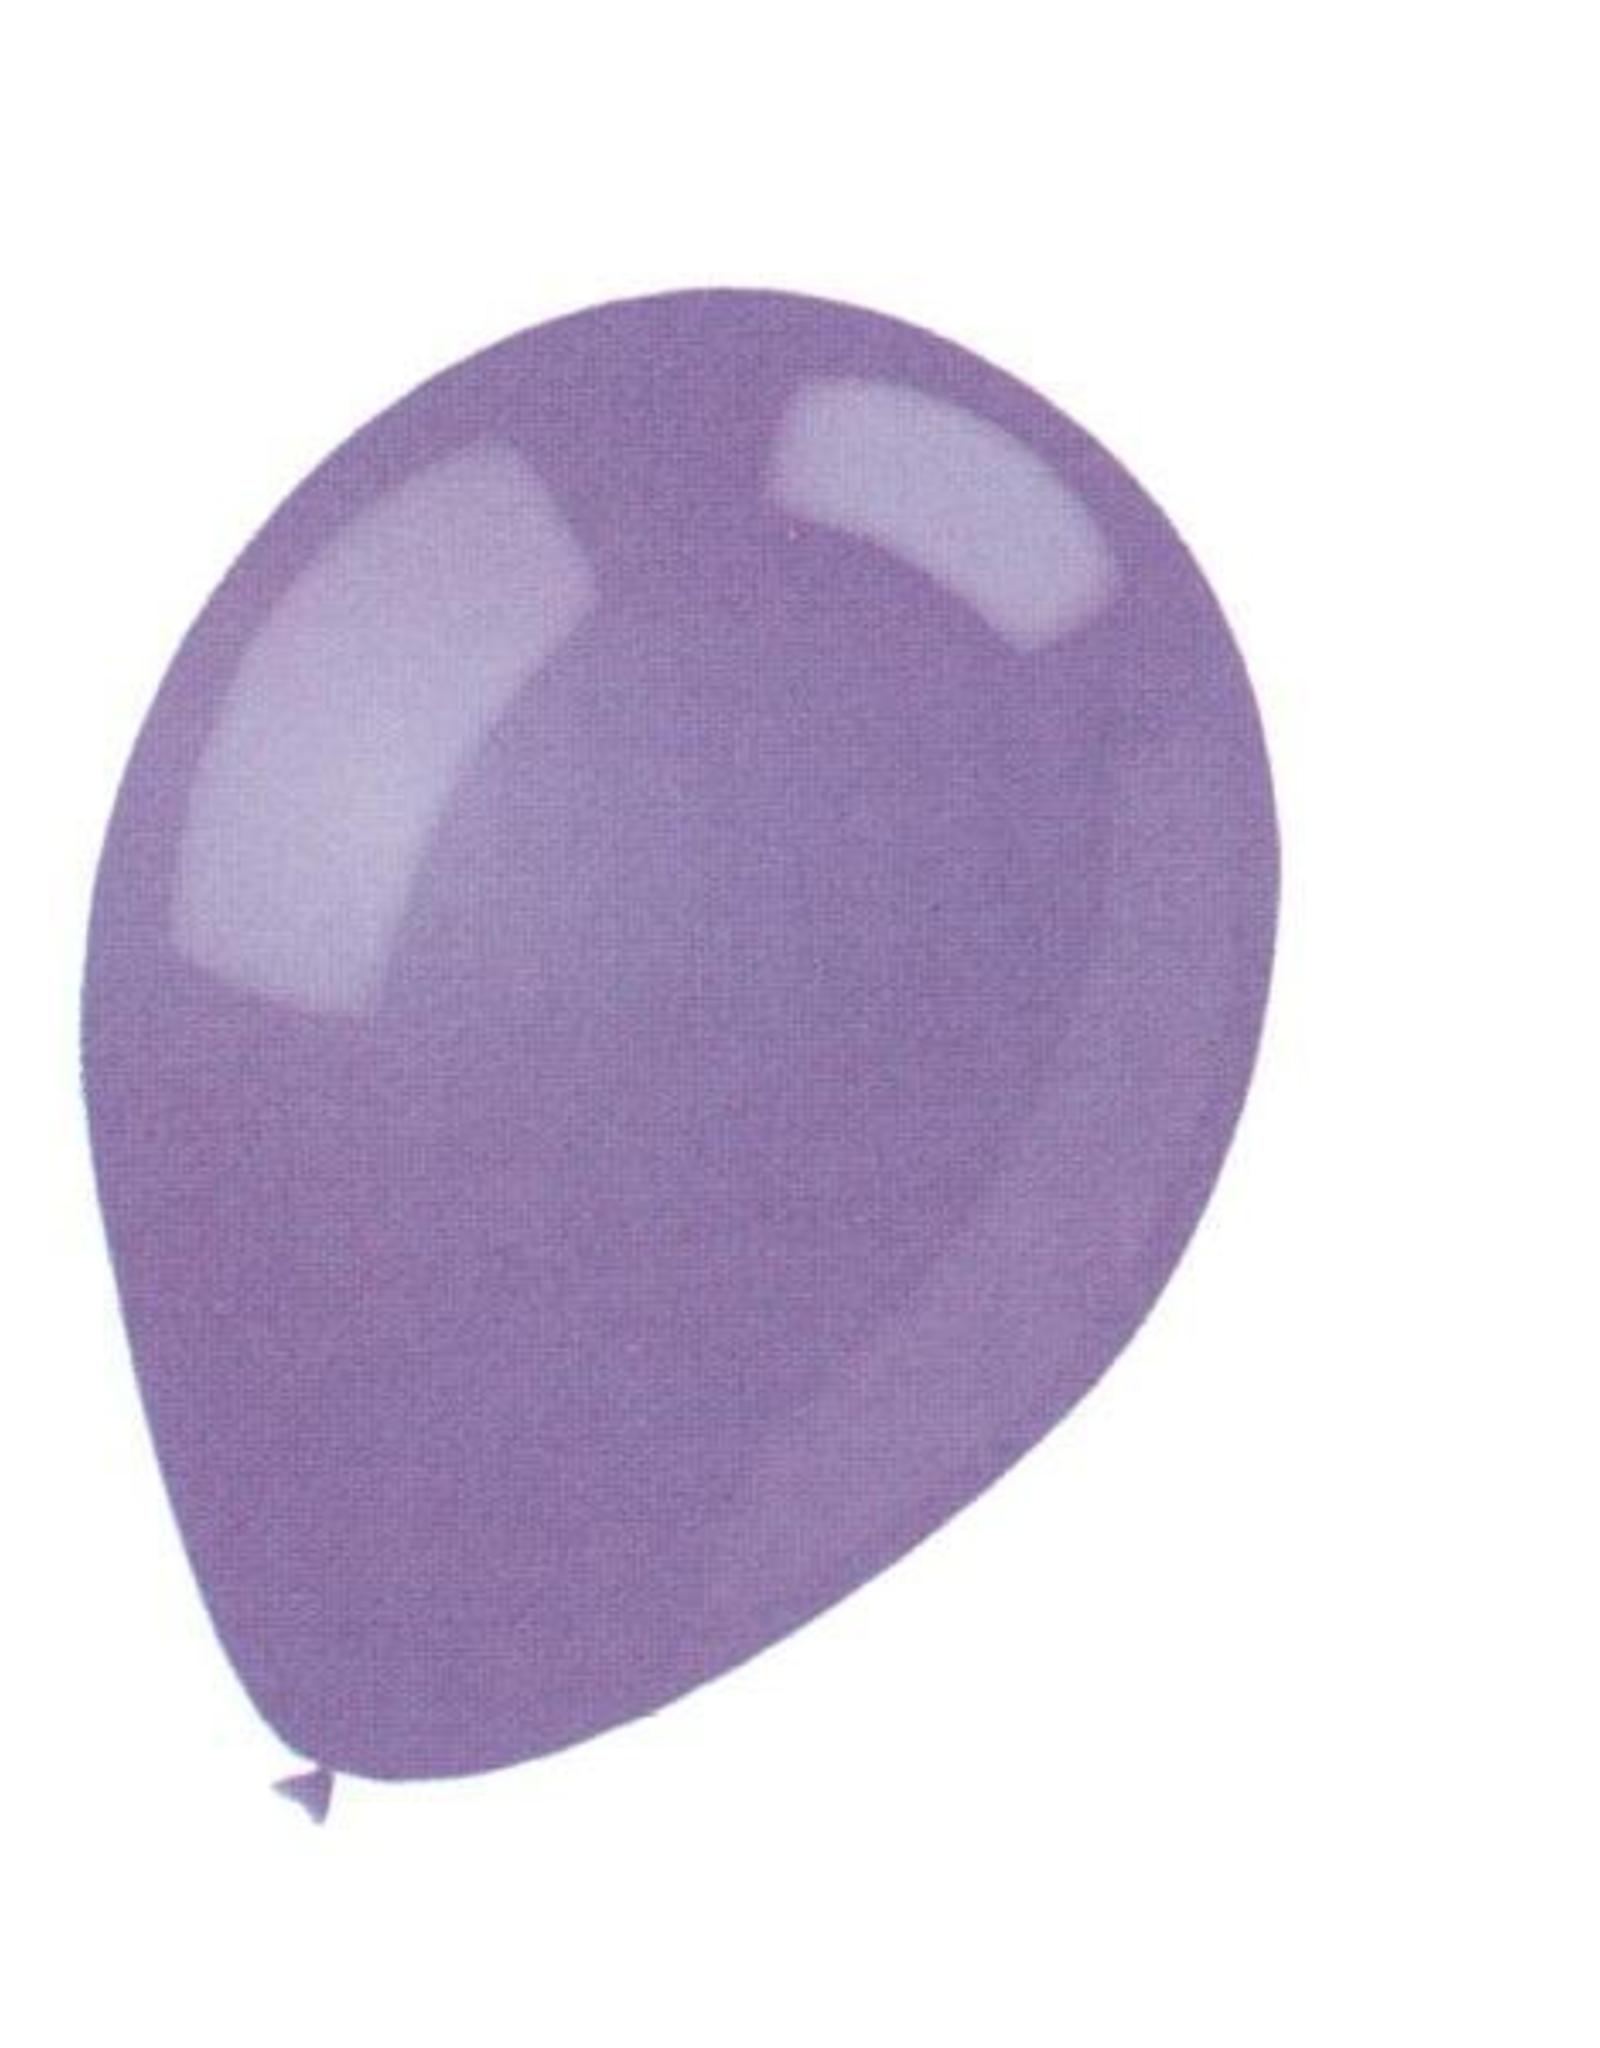 Color Fantastik Latex Balloons Premium 9 Inches (25 Pieces)